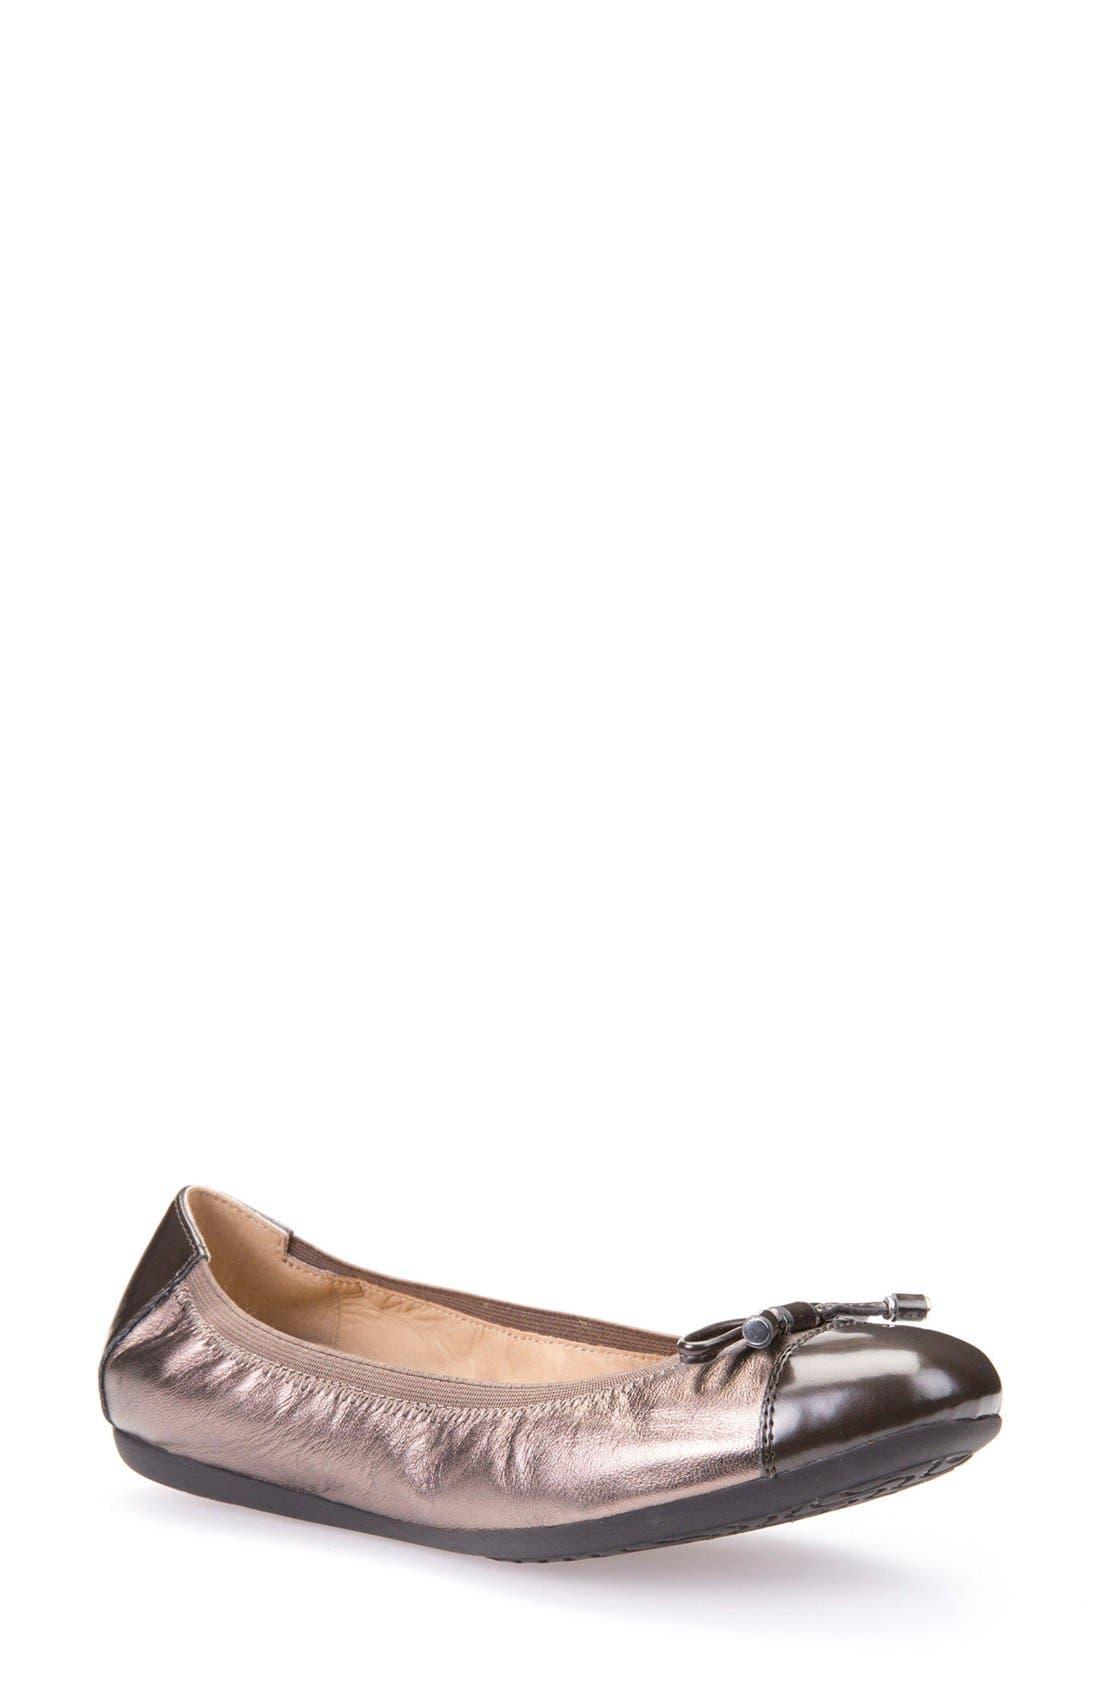 Lola Fit Cap Toe Ballet Flat,                         Main,                         color, Gunmetal Metallic Leather